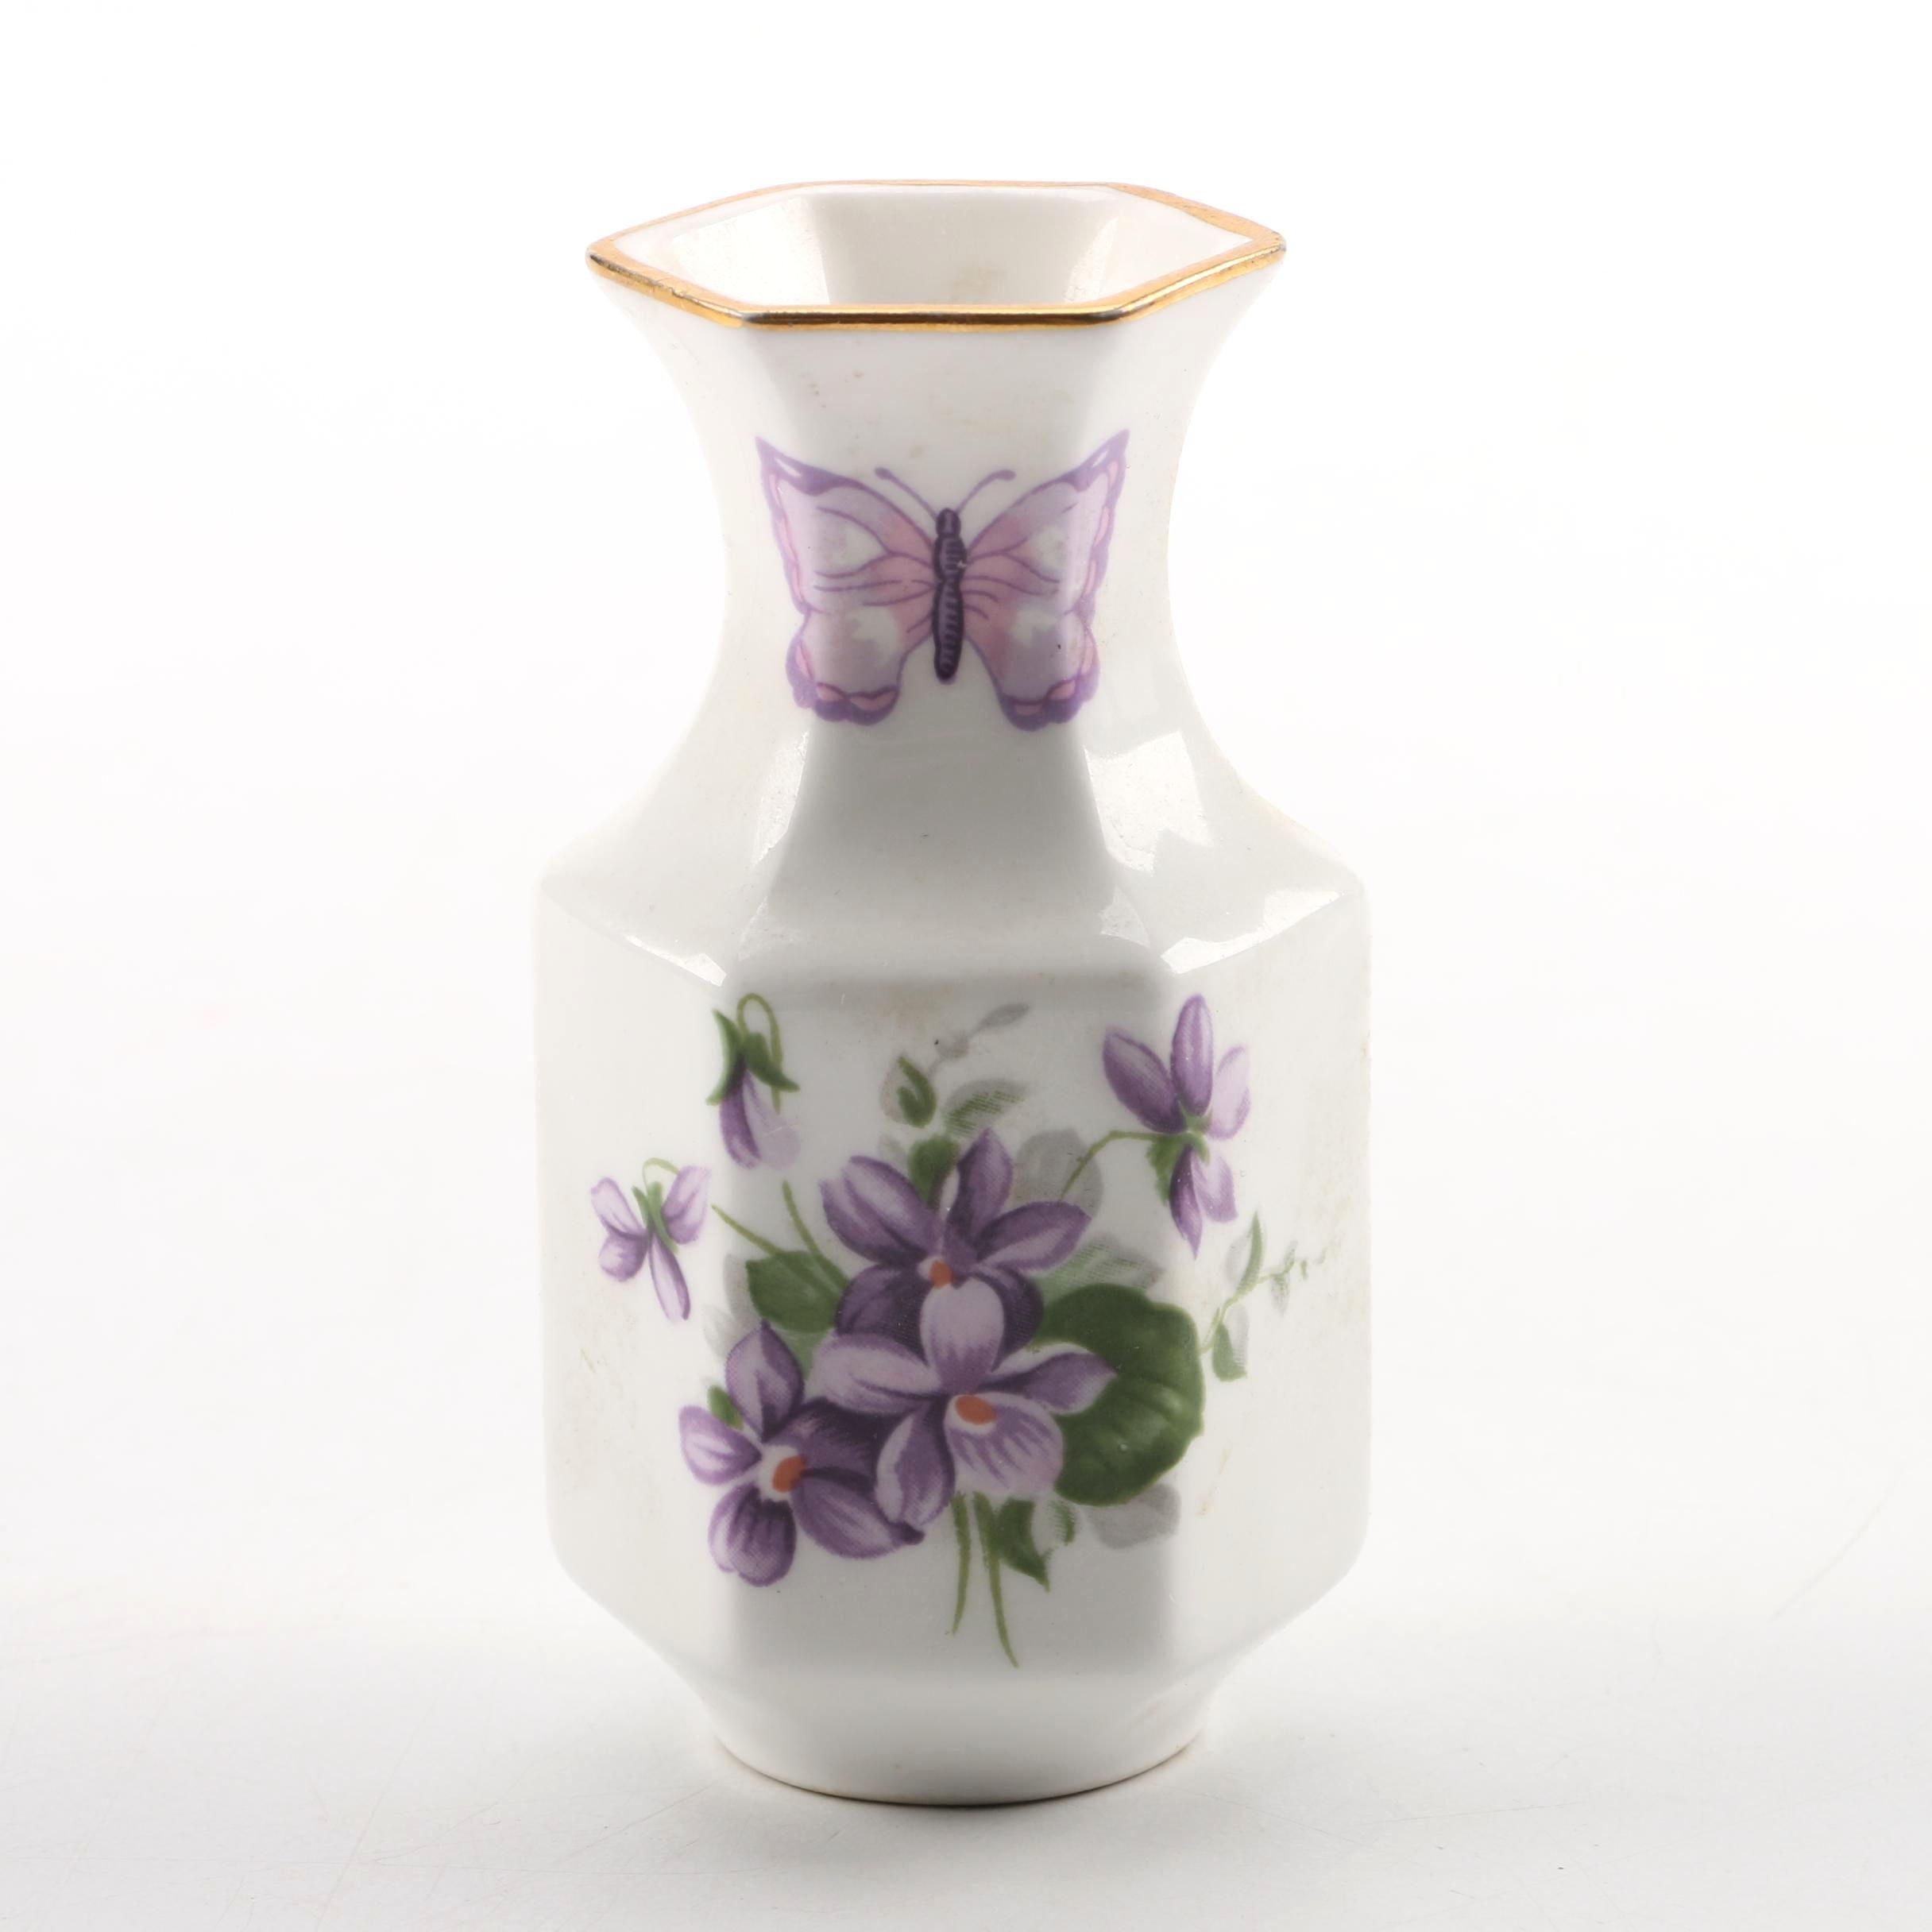 Vintage Aynsley Miniature Porcelain Vase